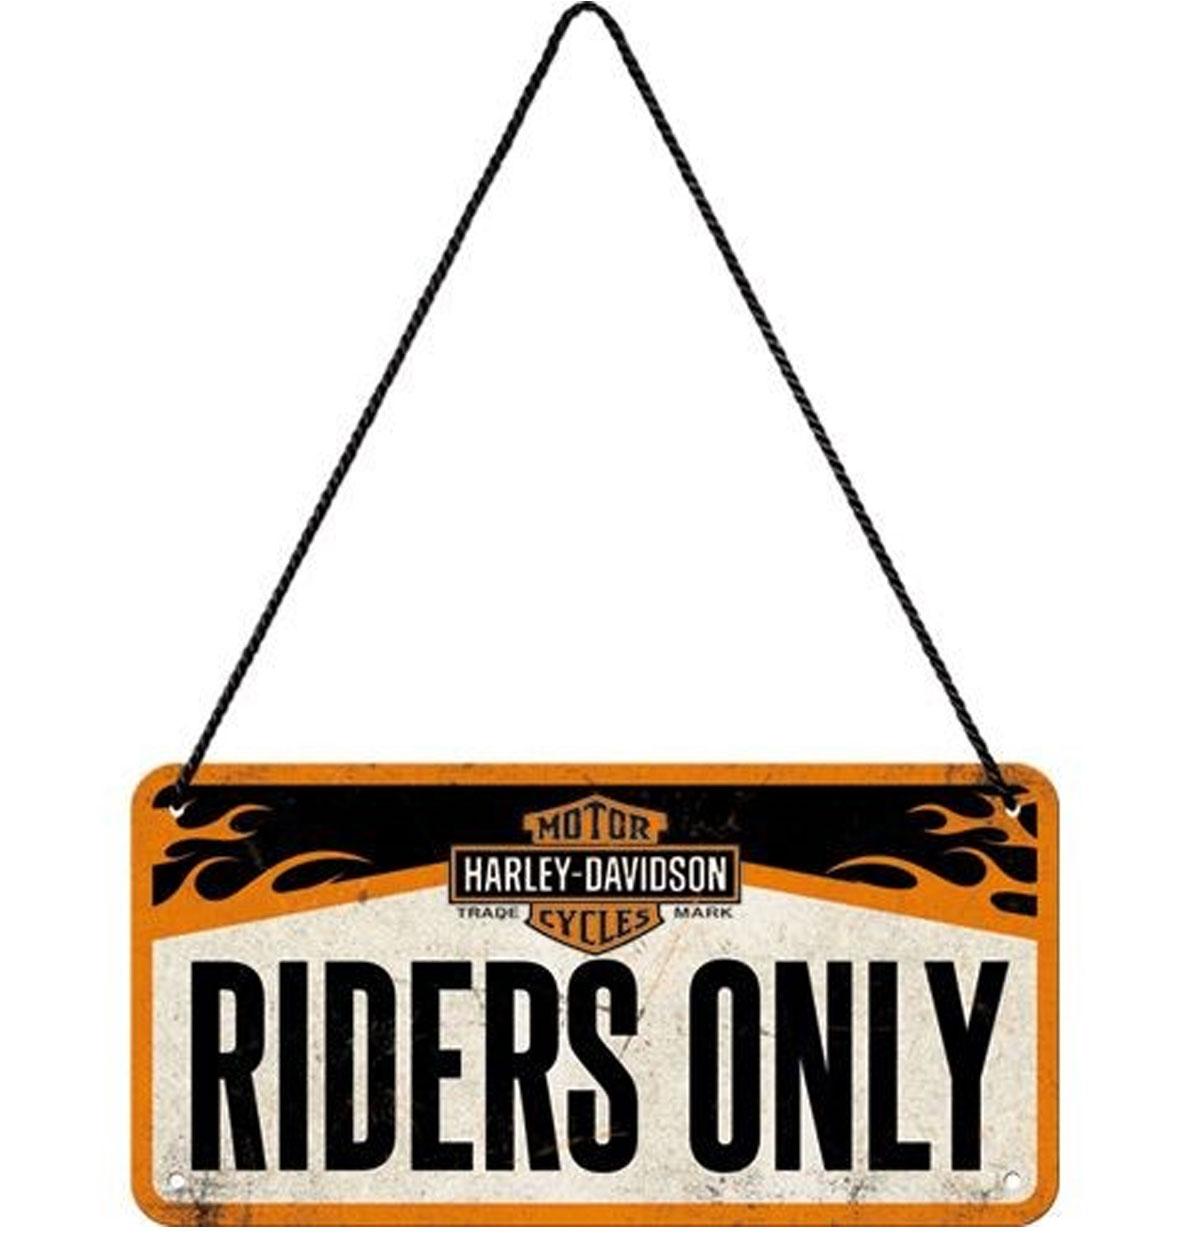 Harley-Davidson Riders Only Hangend Metalen Bord 10 x 20 cm